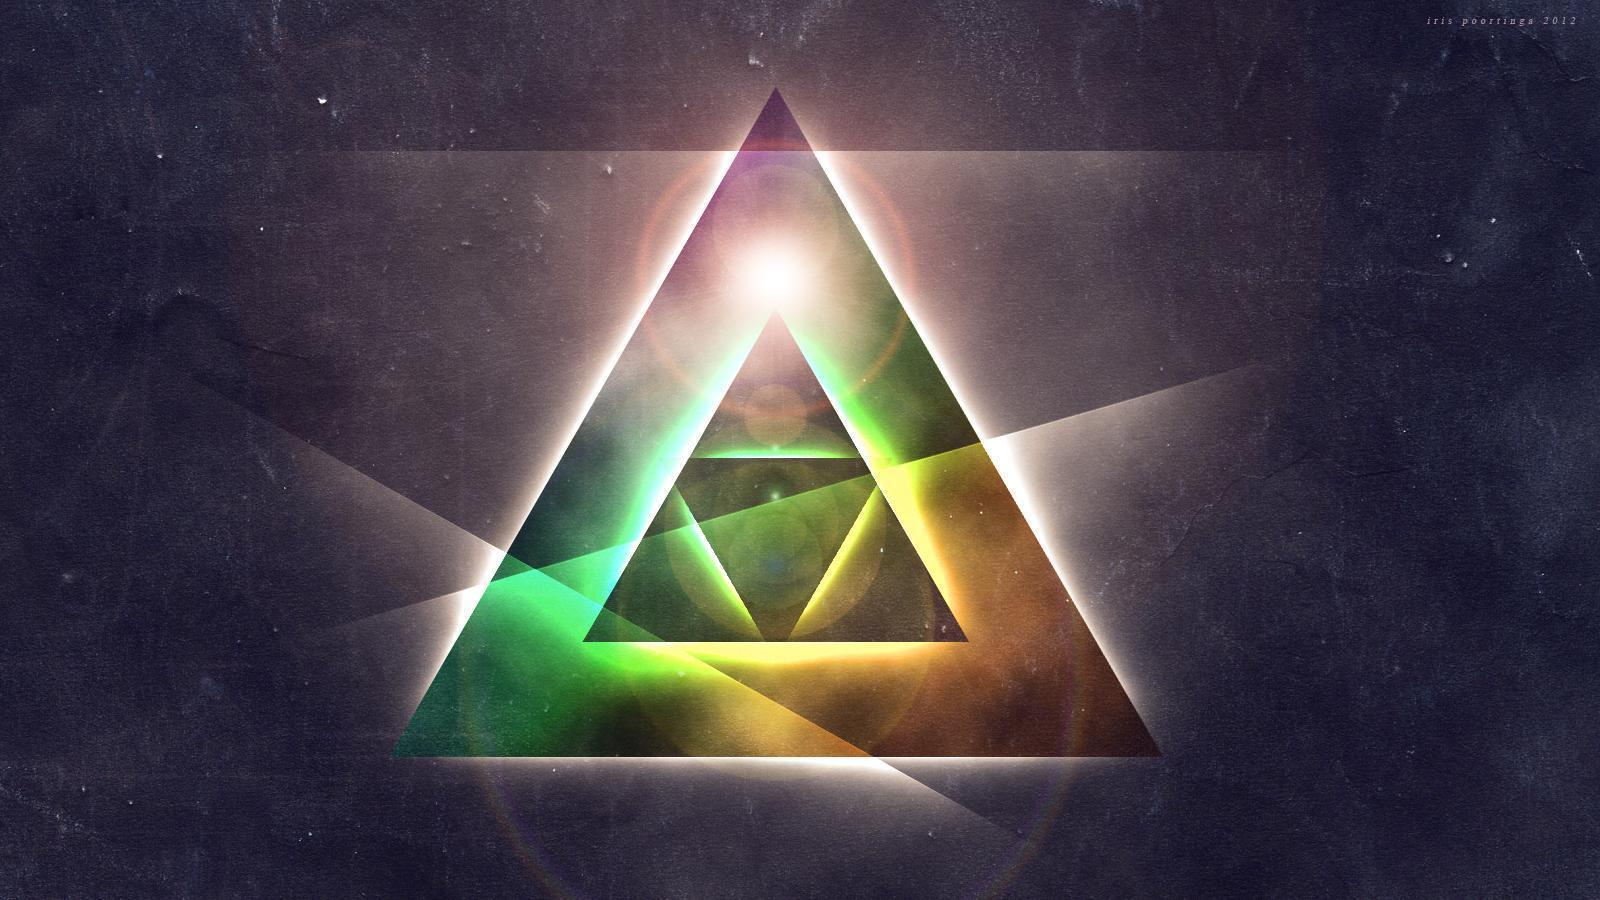 Wallpapers For Illuminati Iphone Wallpaper